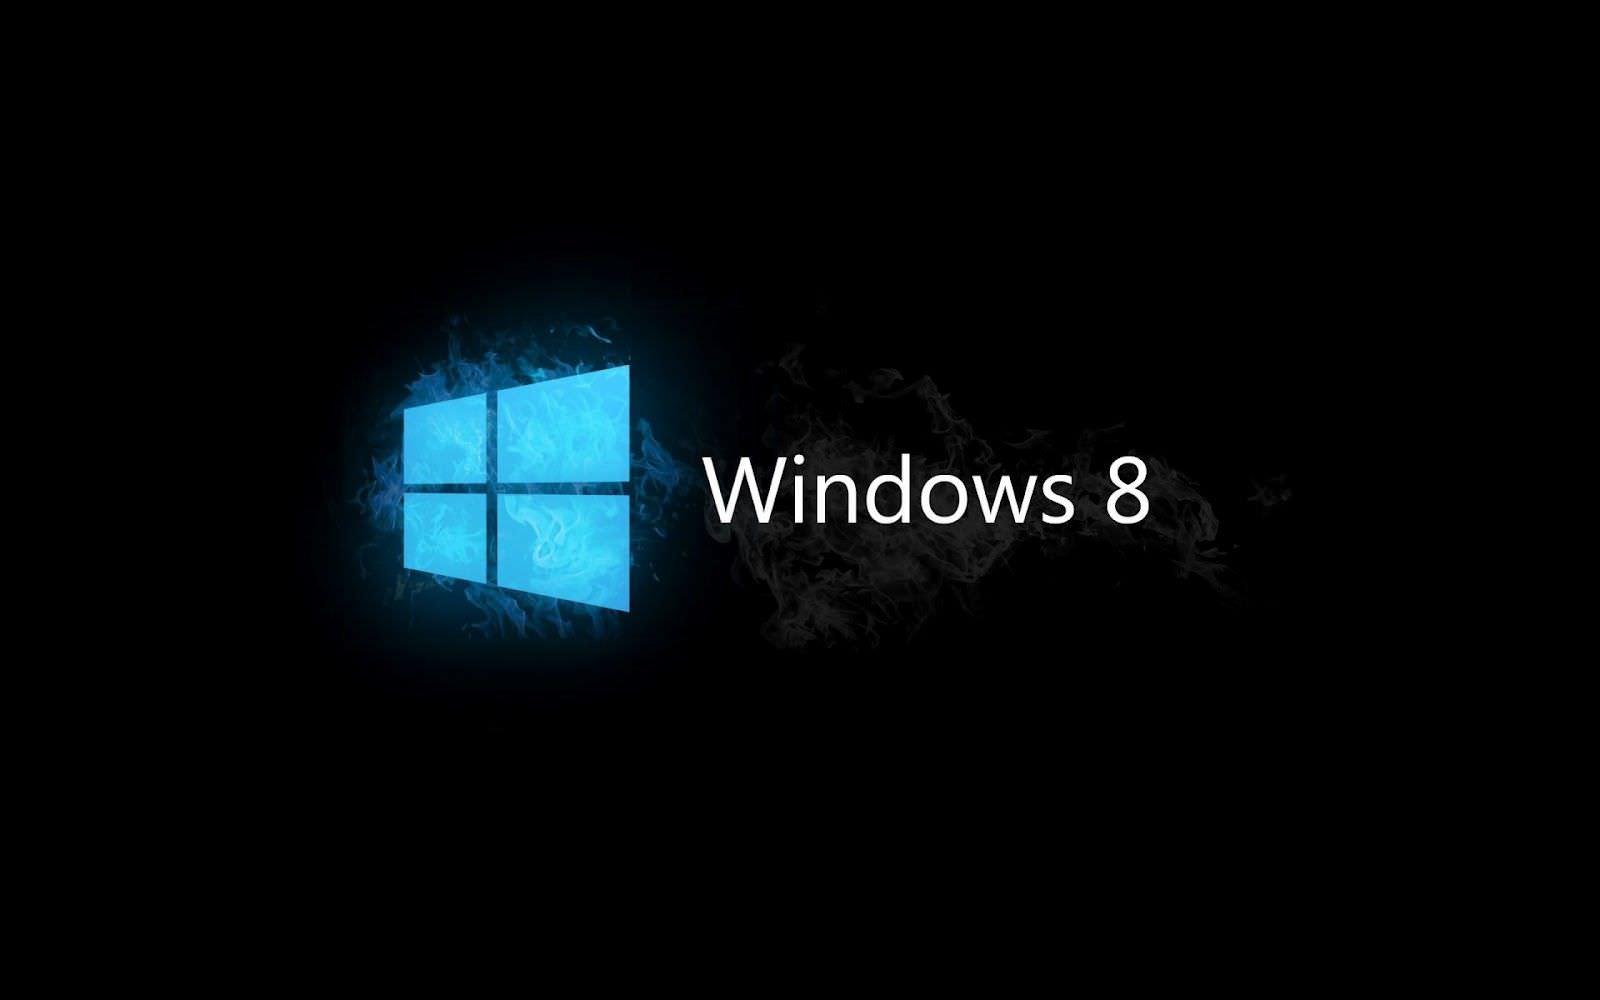 Windows 8 3D Wallpapers Wallpaper Cave - picturesfit com